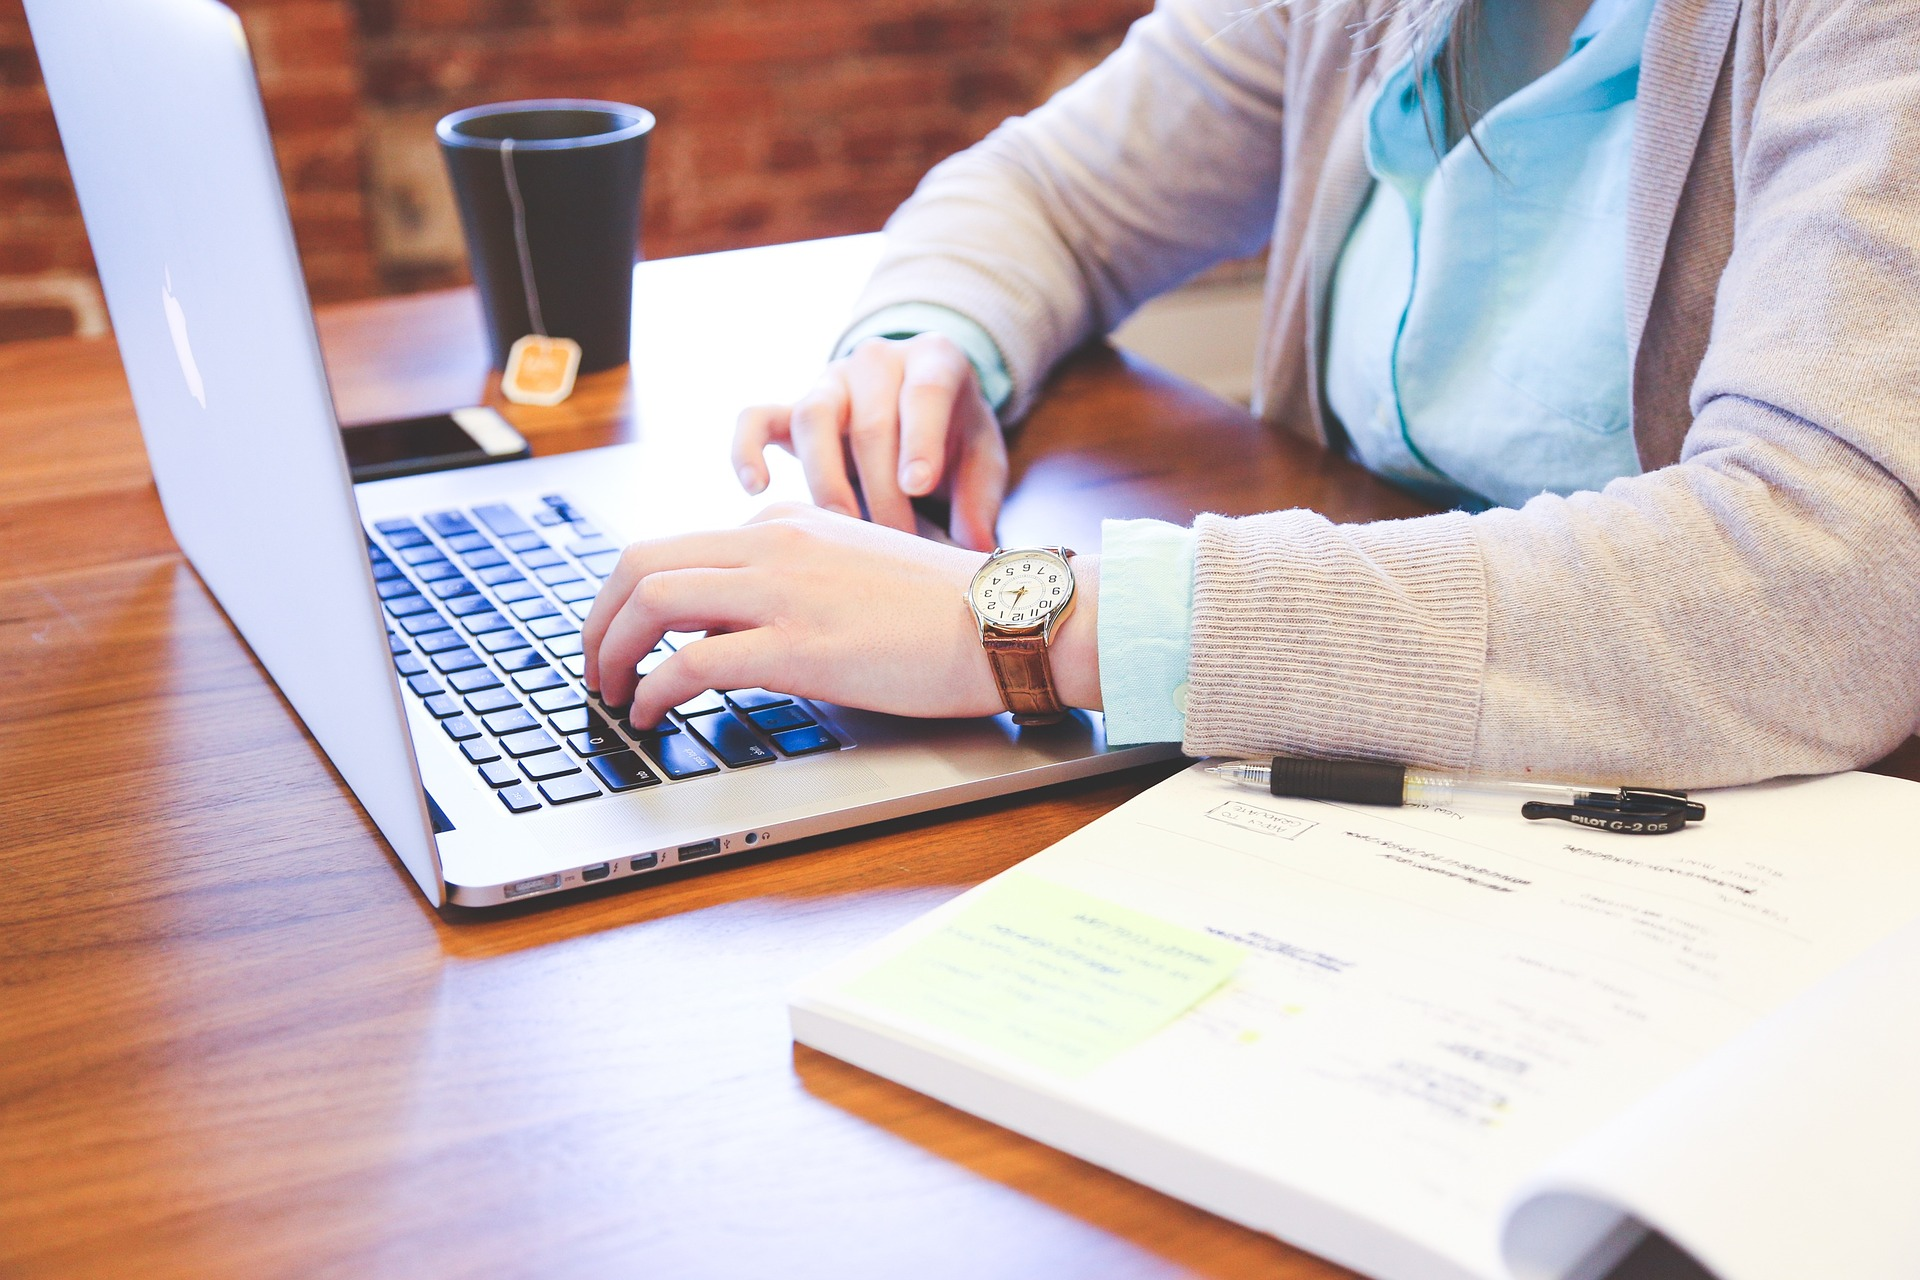 devojka-kuca-na-laptopu